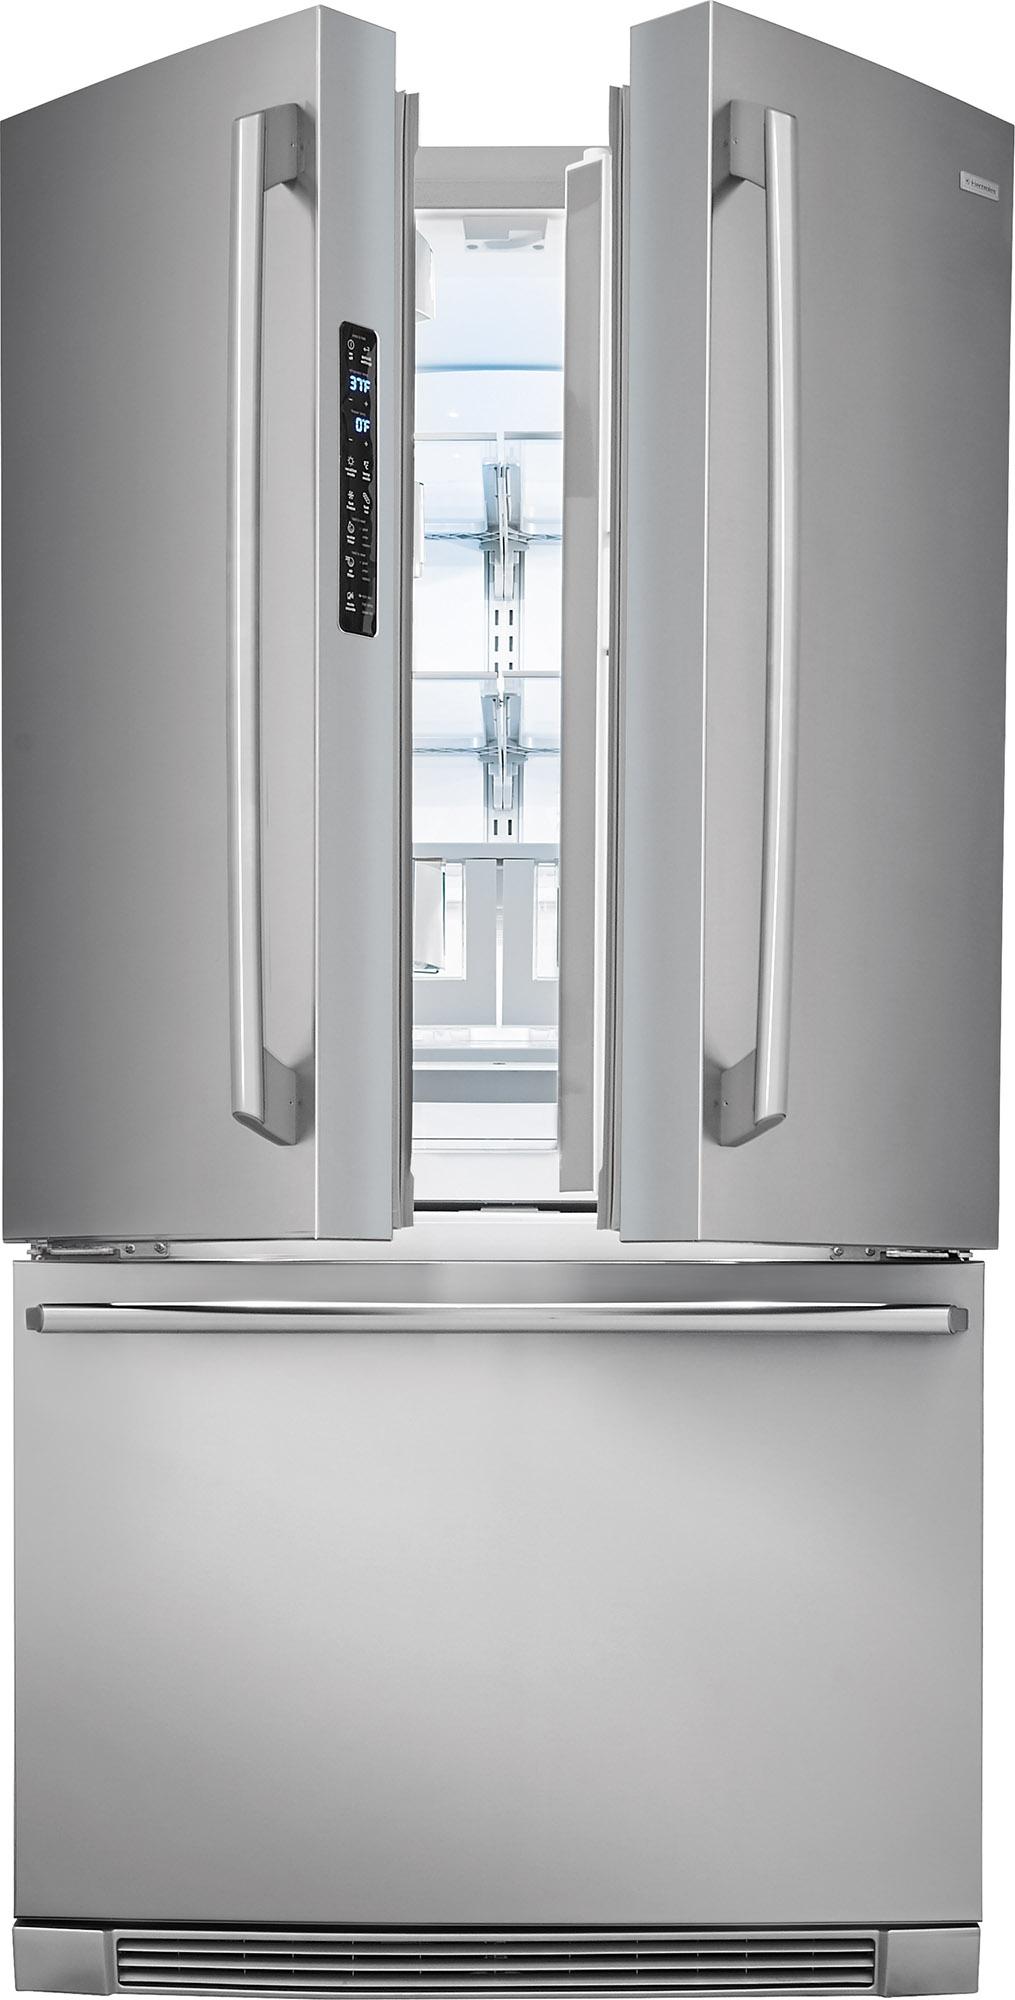 Electrolux 223 Cu Ft Counter Depth French Door Refrigerator